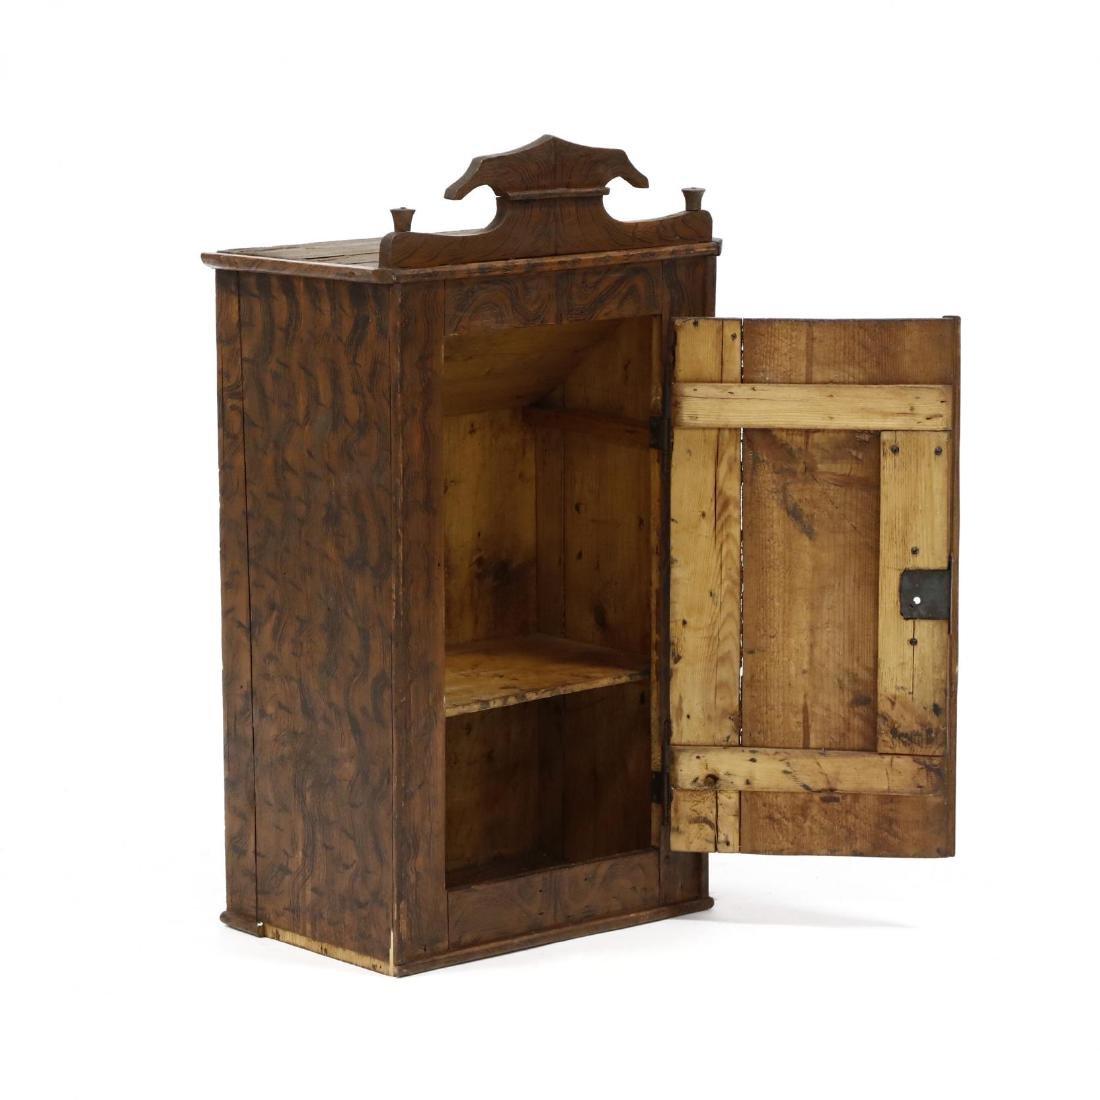 Antique Grain Painted Hanging Cabinet - 2